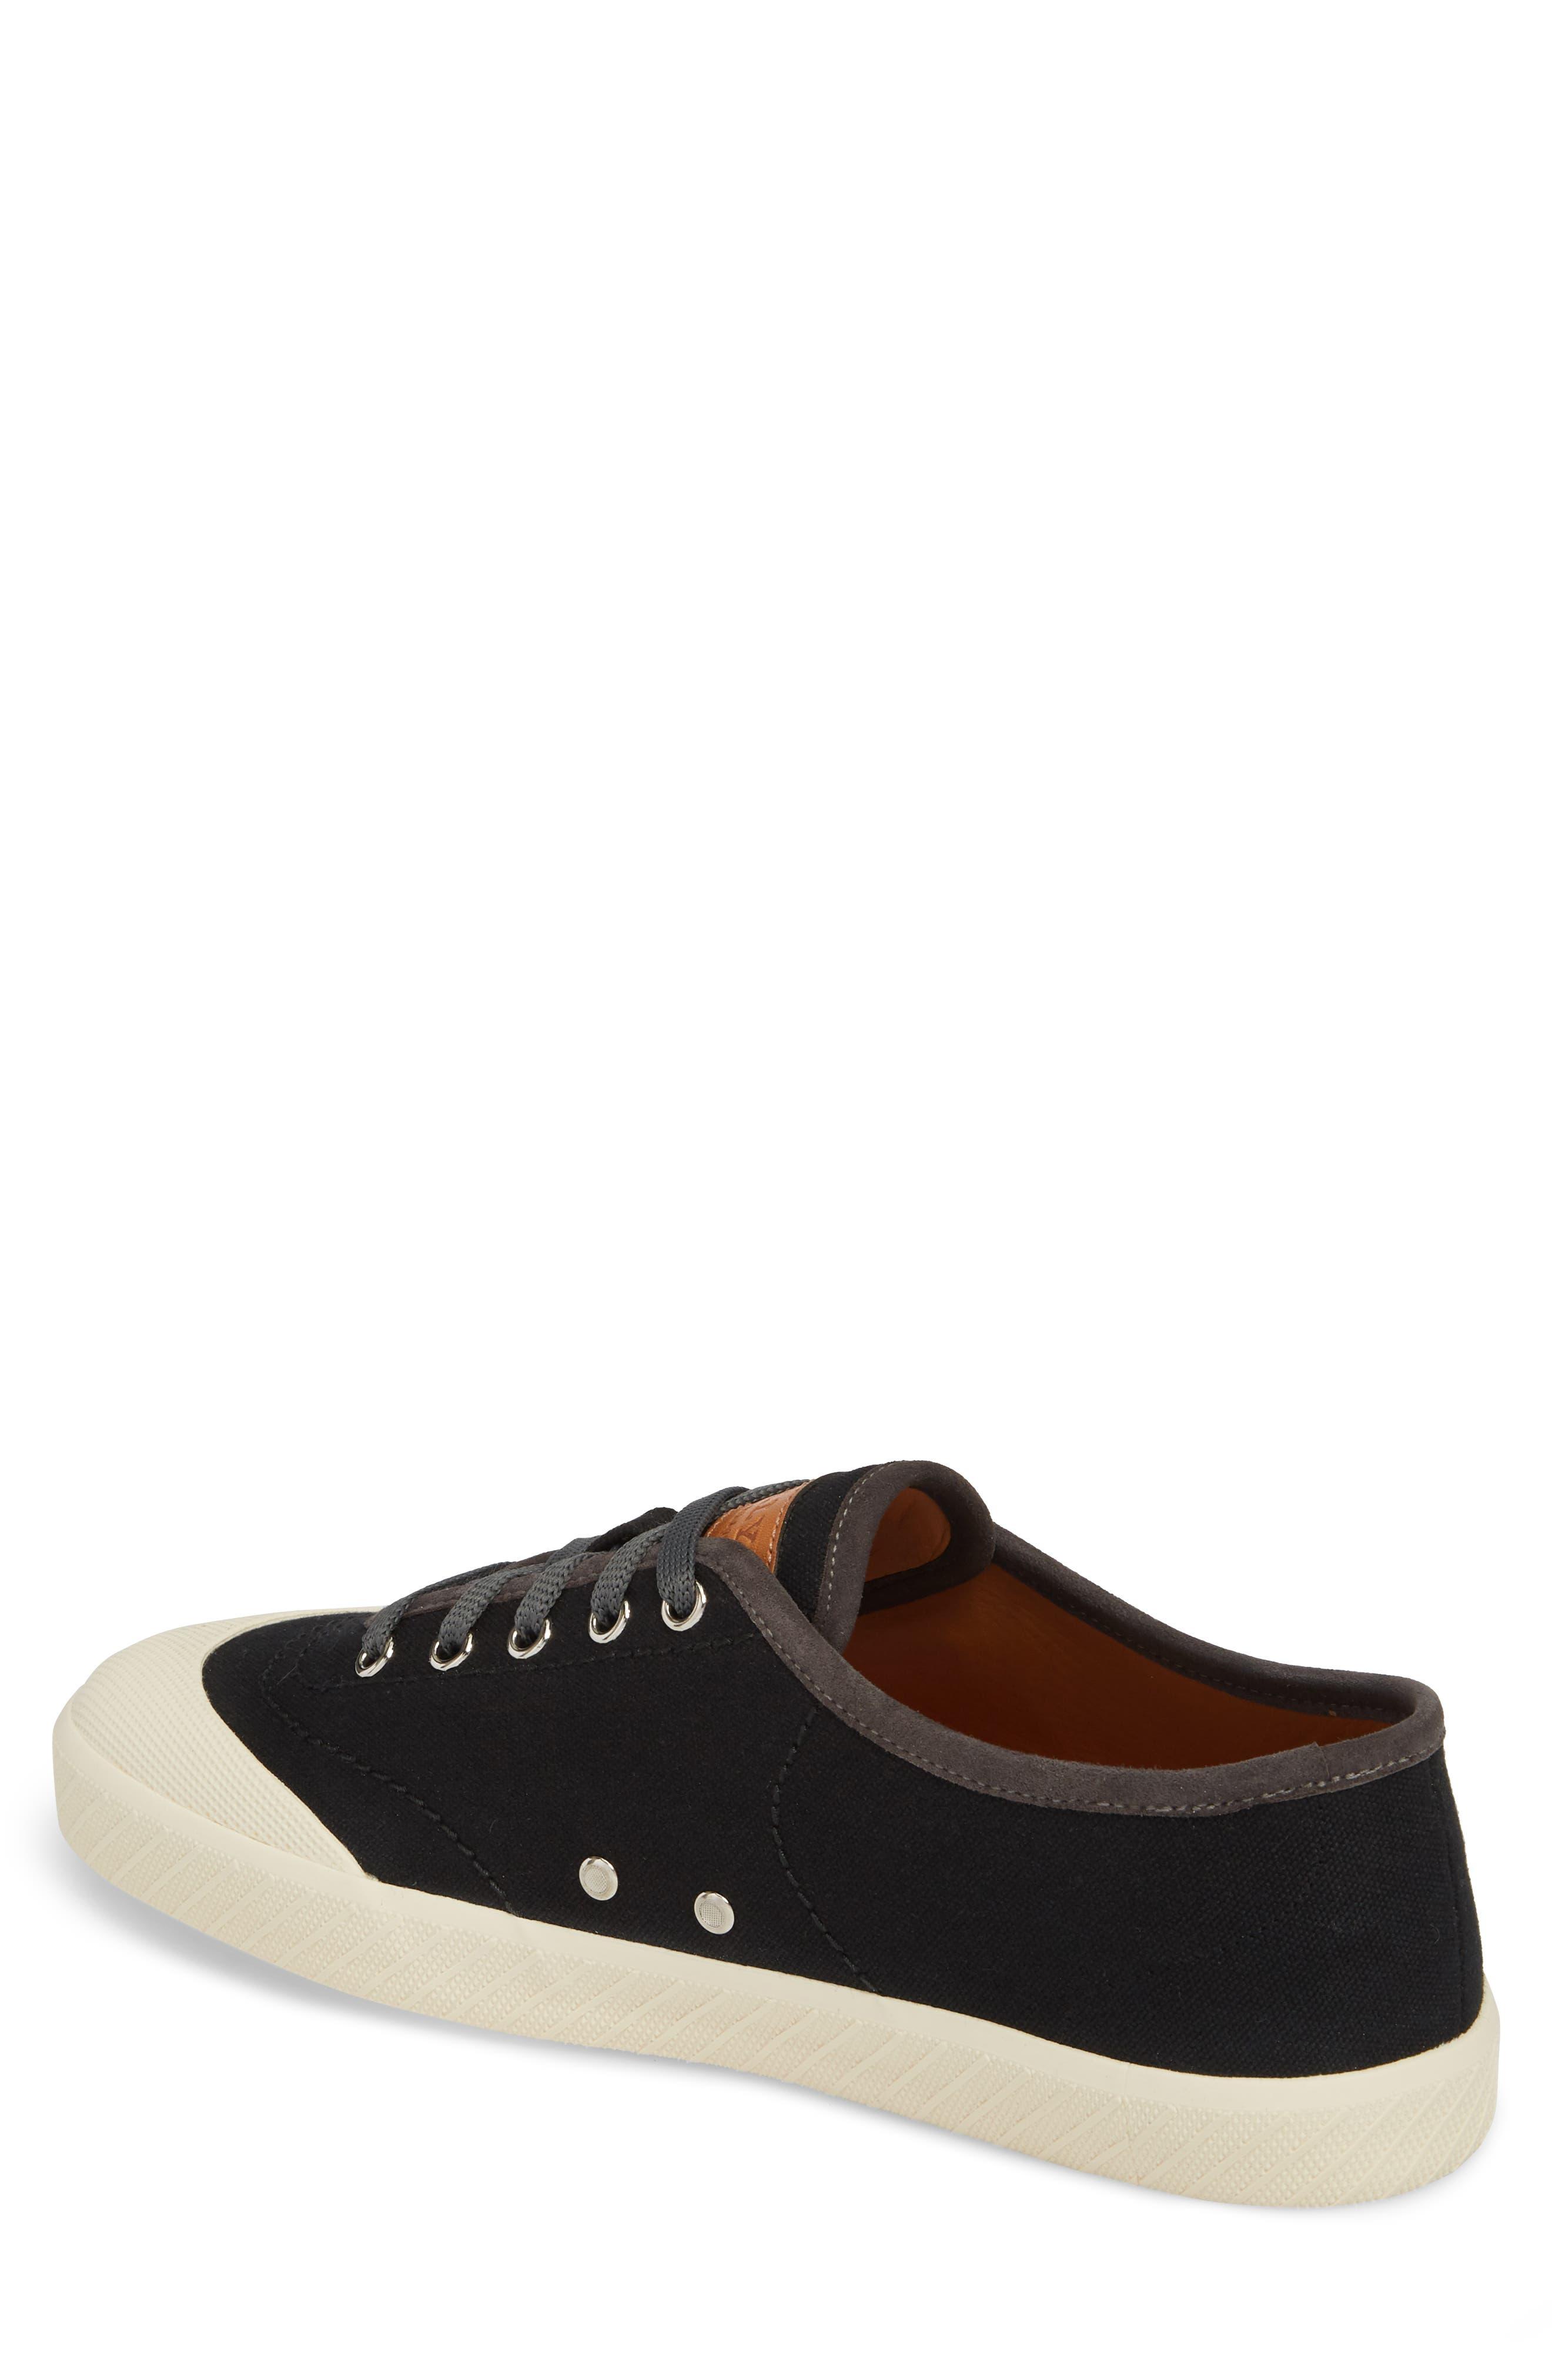 Silio Low Top Sneaker,                             Alternate thumbnail 2, color,                             001